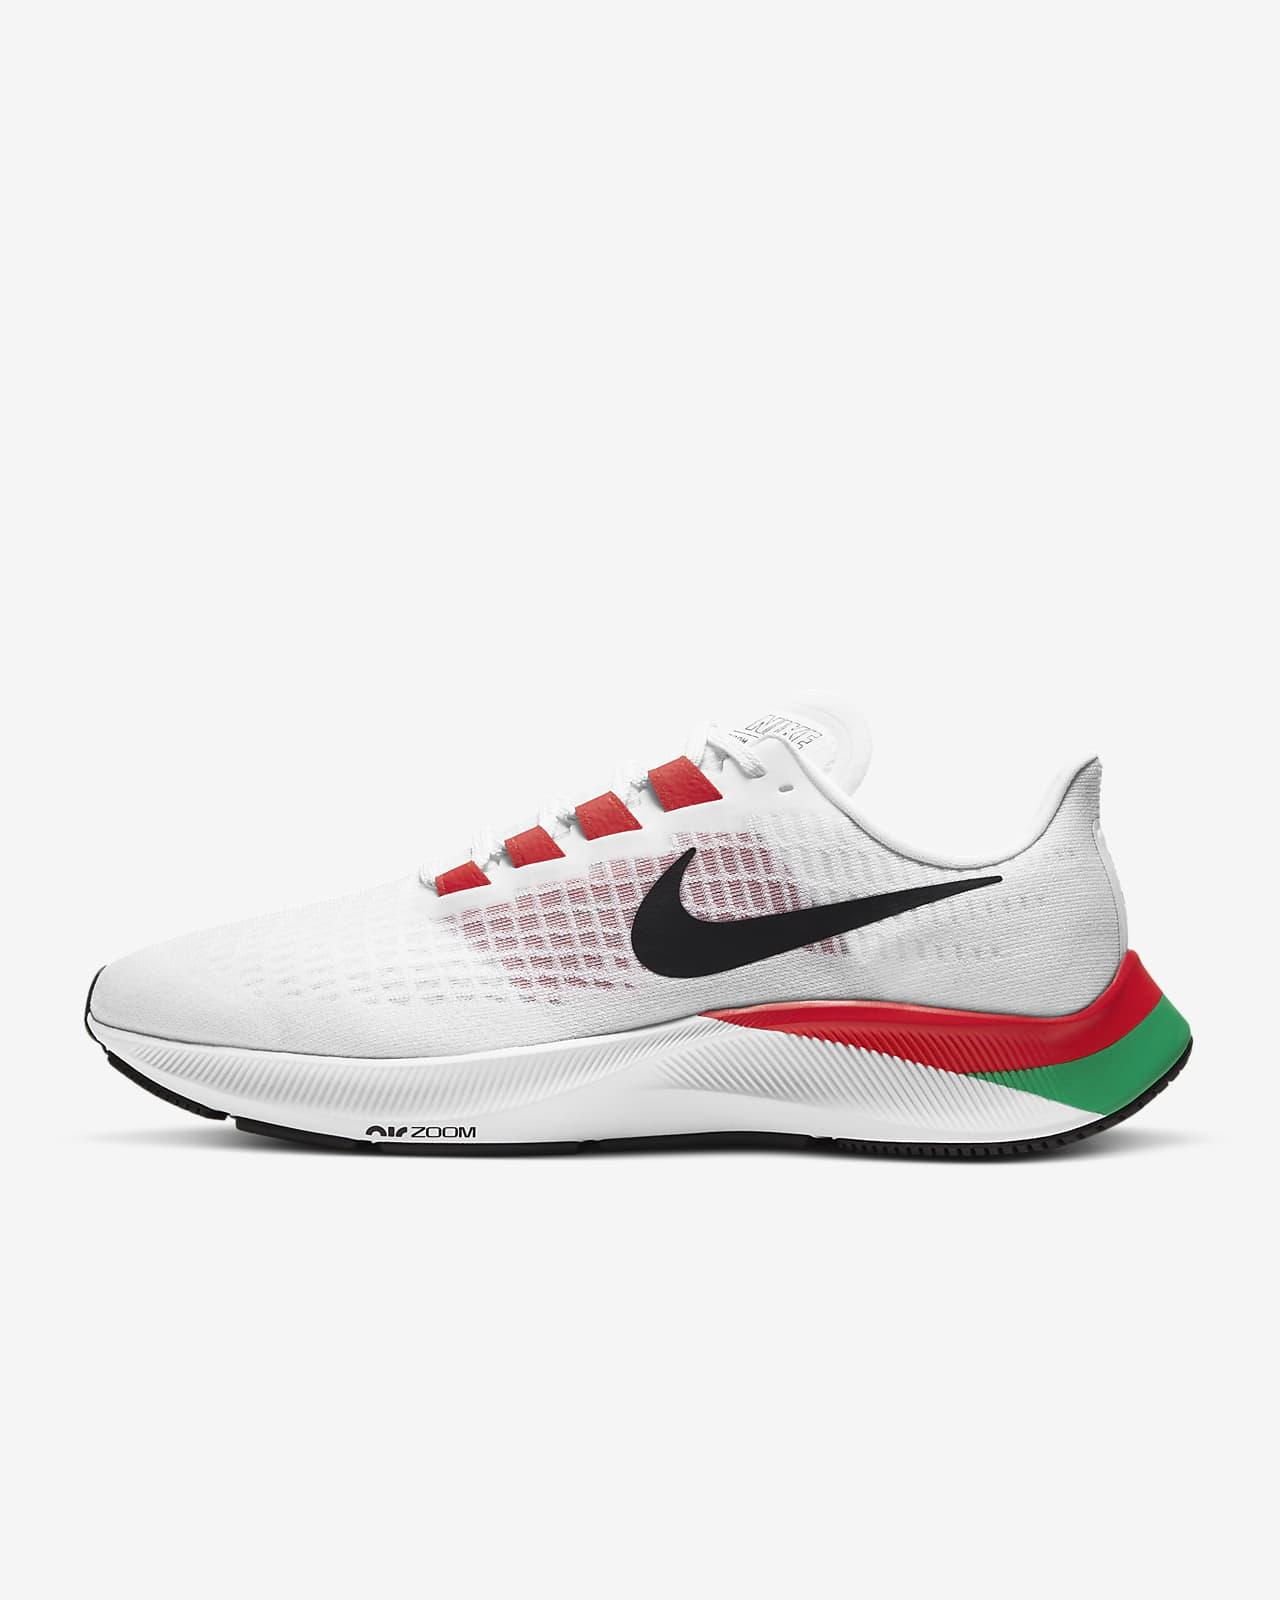 Calzado de running para hombre Nike Air Zoom Pegasus 37 Eliud Kipchoge